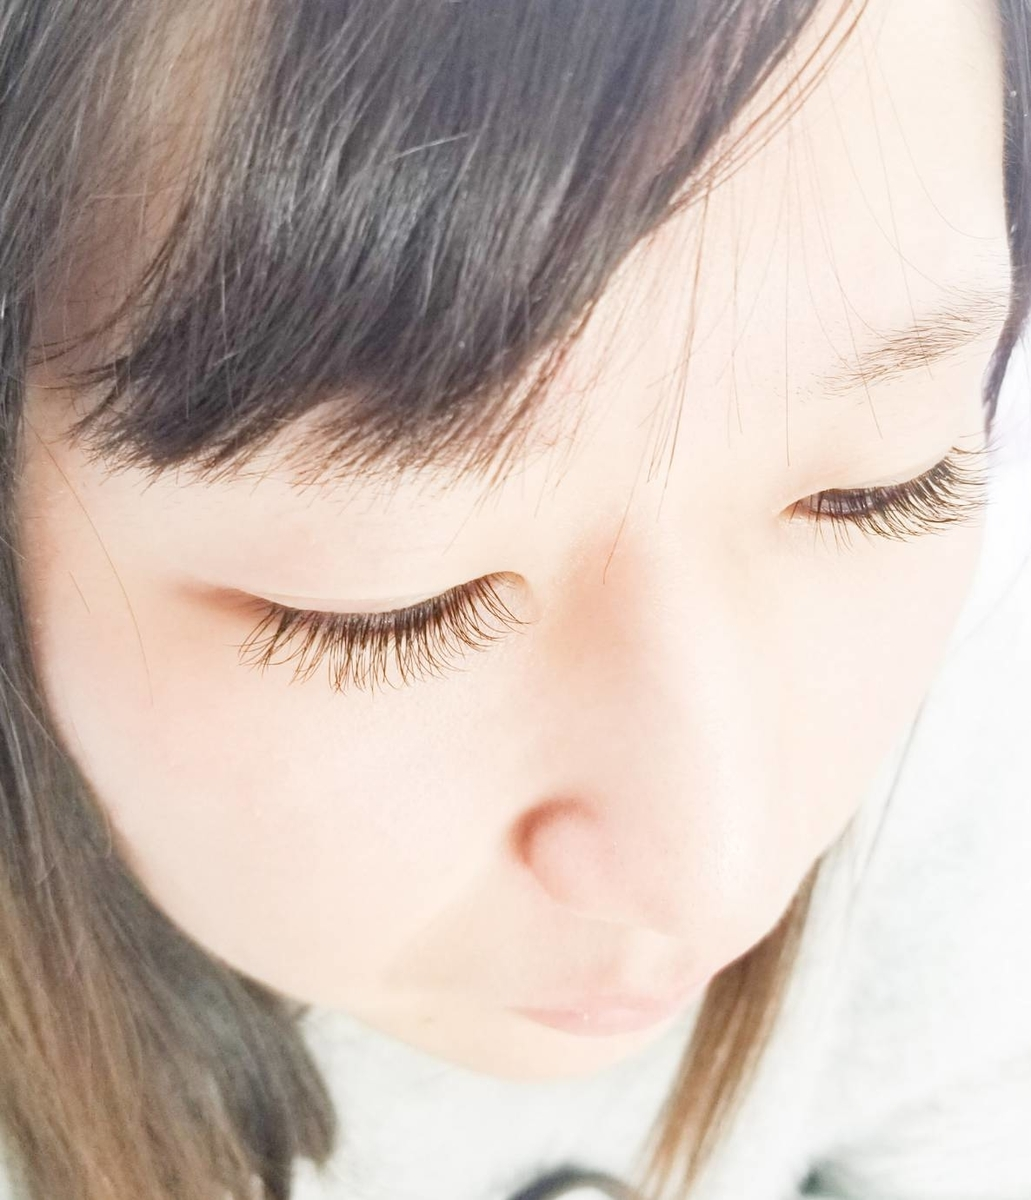 f:id:princess-e-0113:20190415001408j:plain